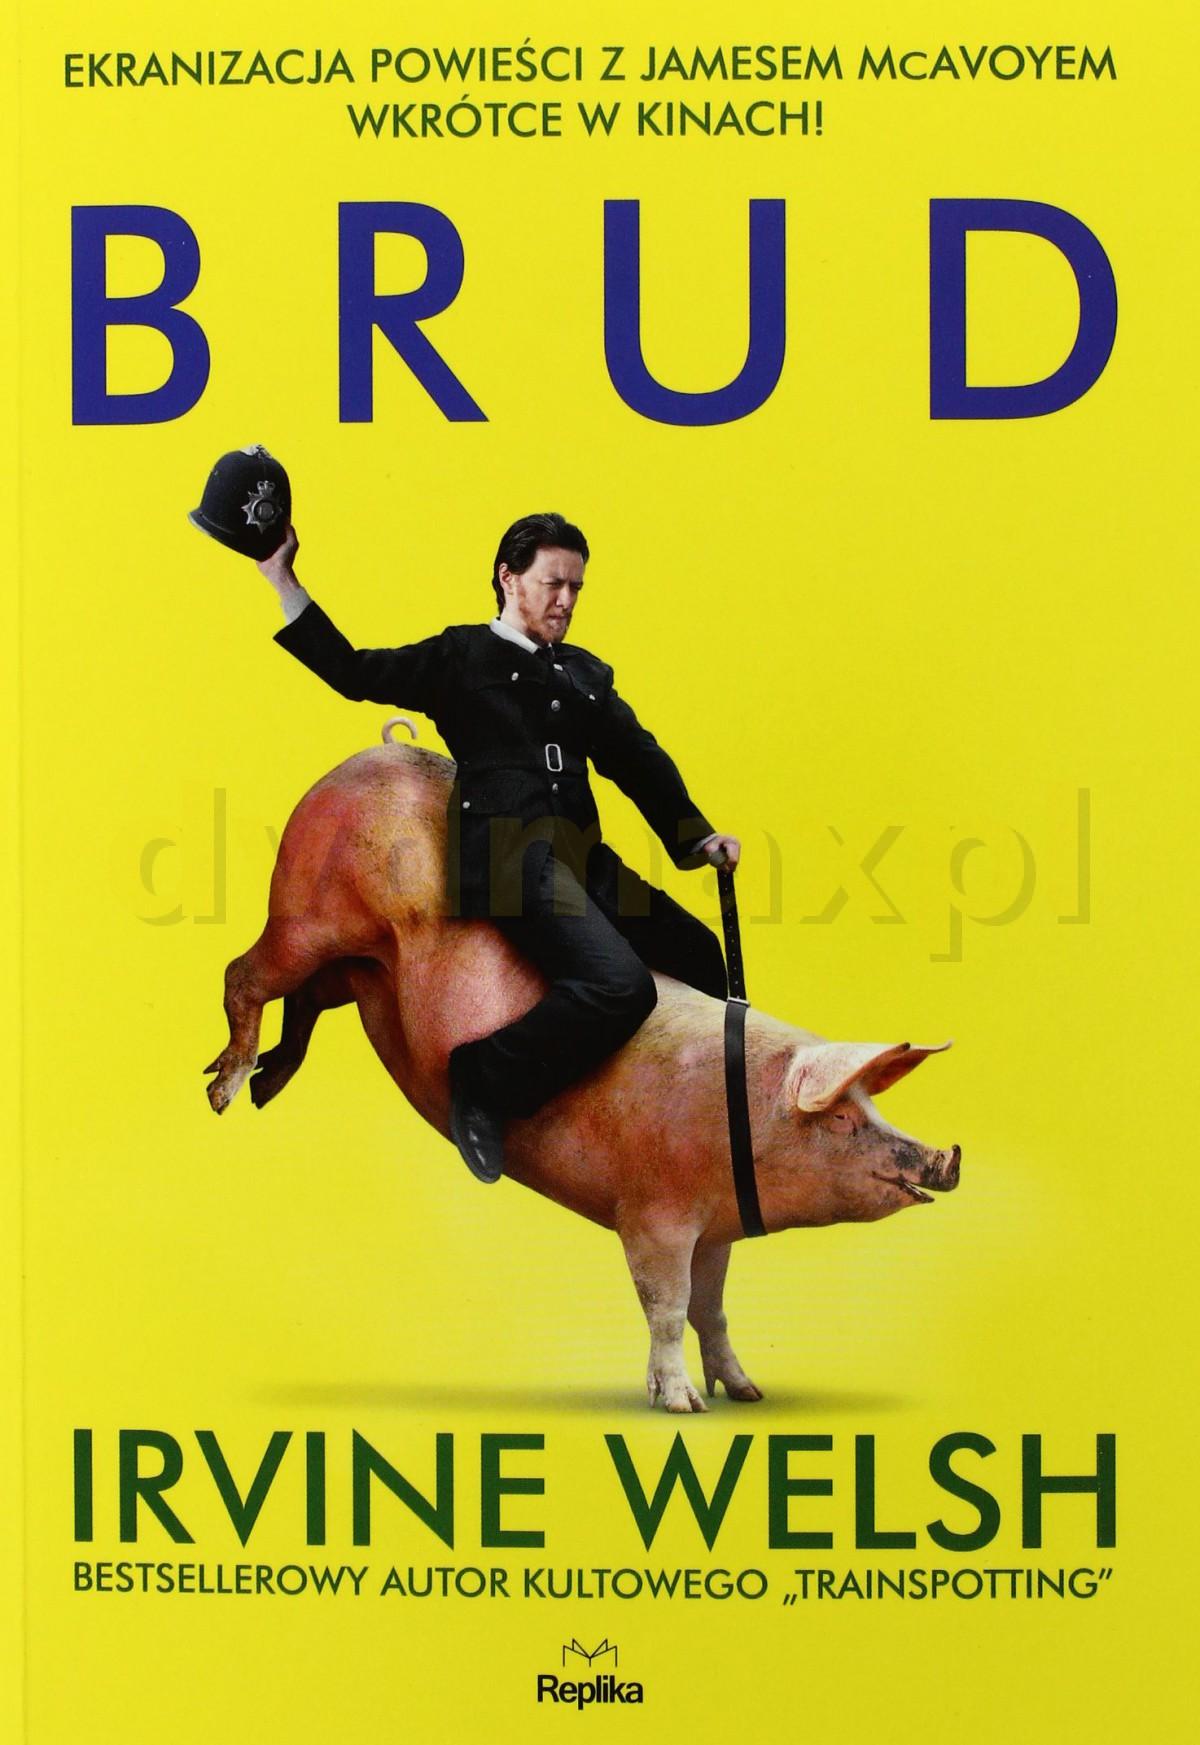 Brud - Irvine Welsh [KSIĄŻKA] - Irvine Welsh